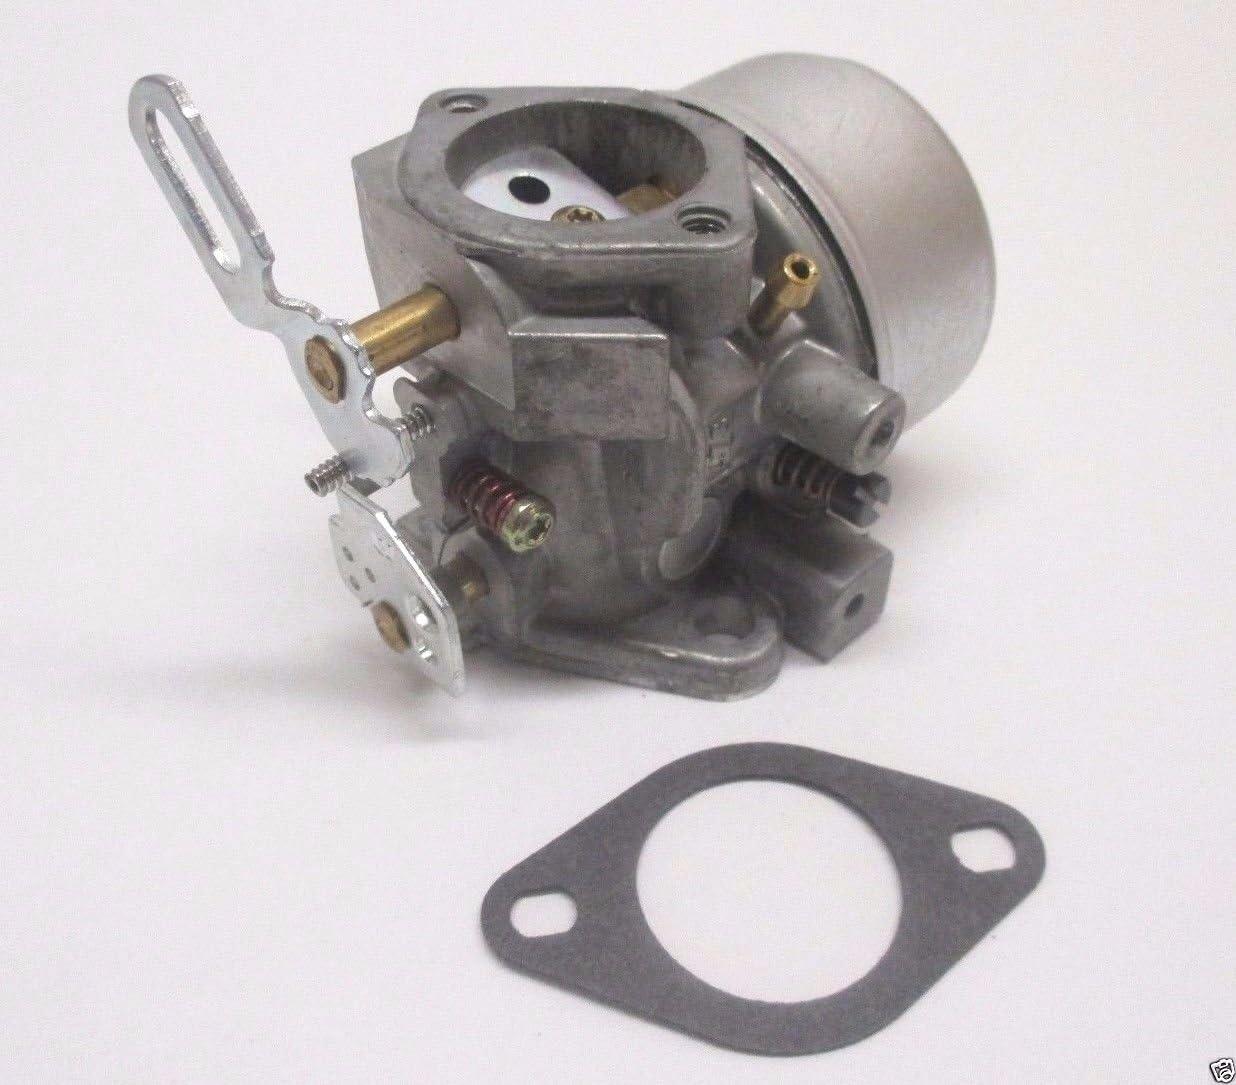 Tecumseh 632370A carburetor fits HM100 HMSK100 HMSK90 Horizontal Engine